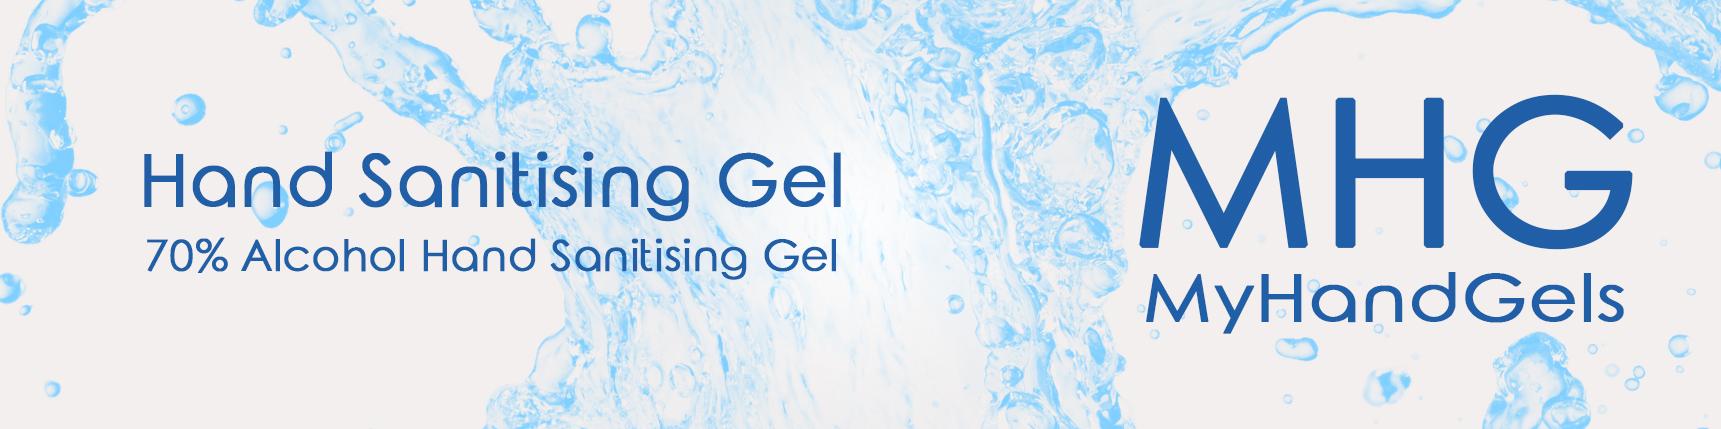 Hand Sanitising Gels